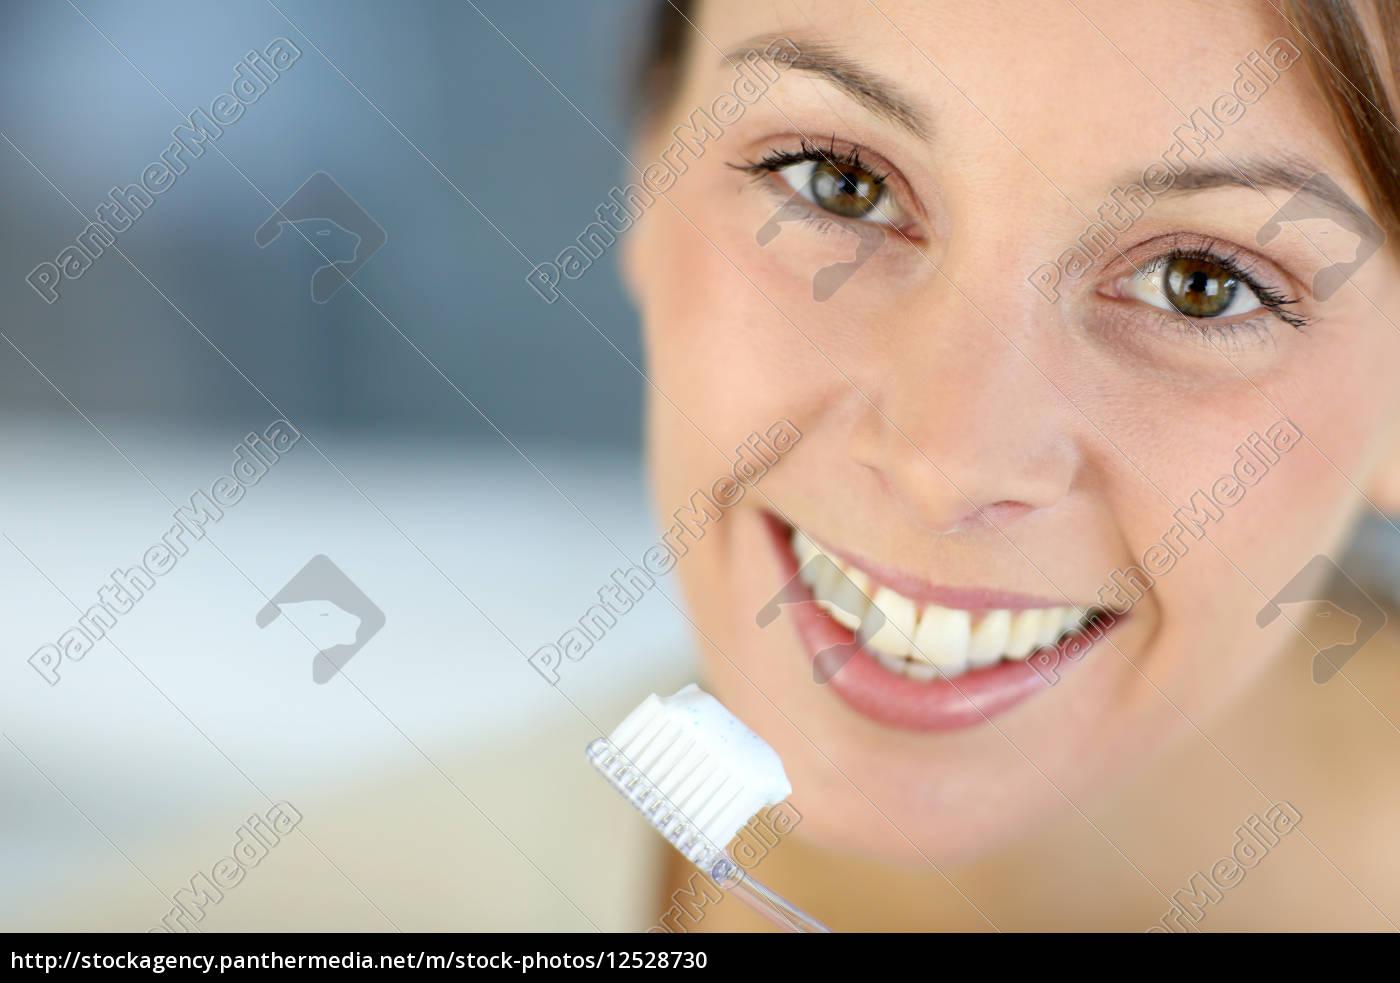 primer, plano, en, la, sonrisa, dentada - 12528730